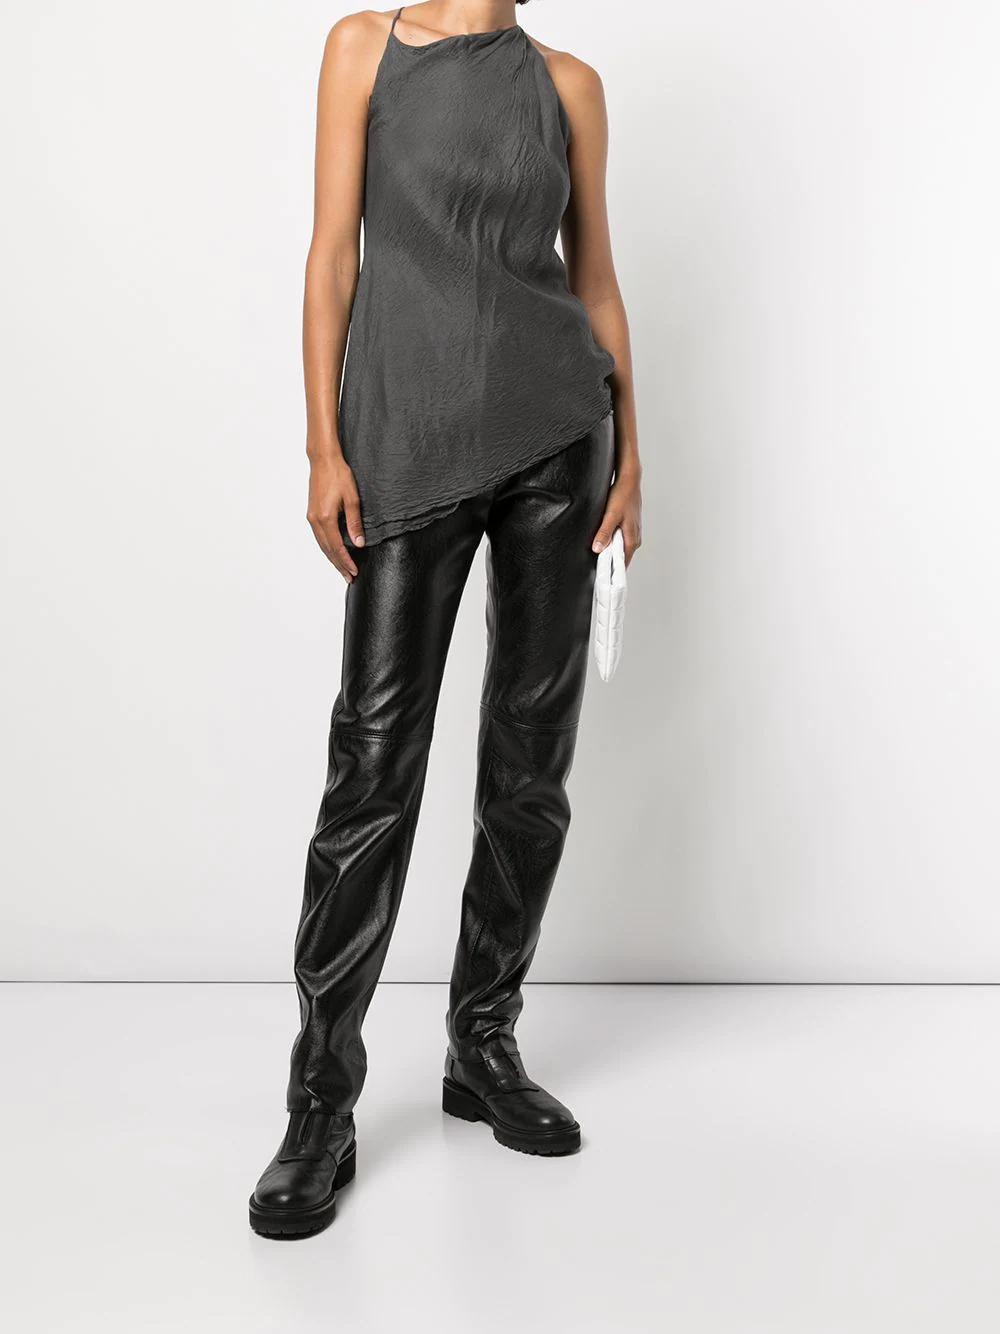 Marc Le Bihan Asymmetric Silk Top 1134лв